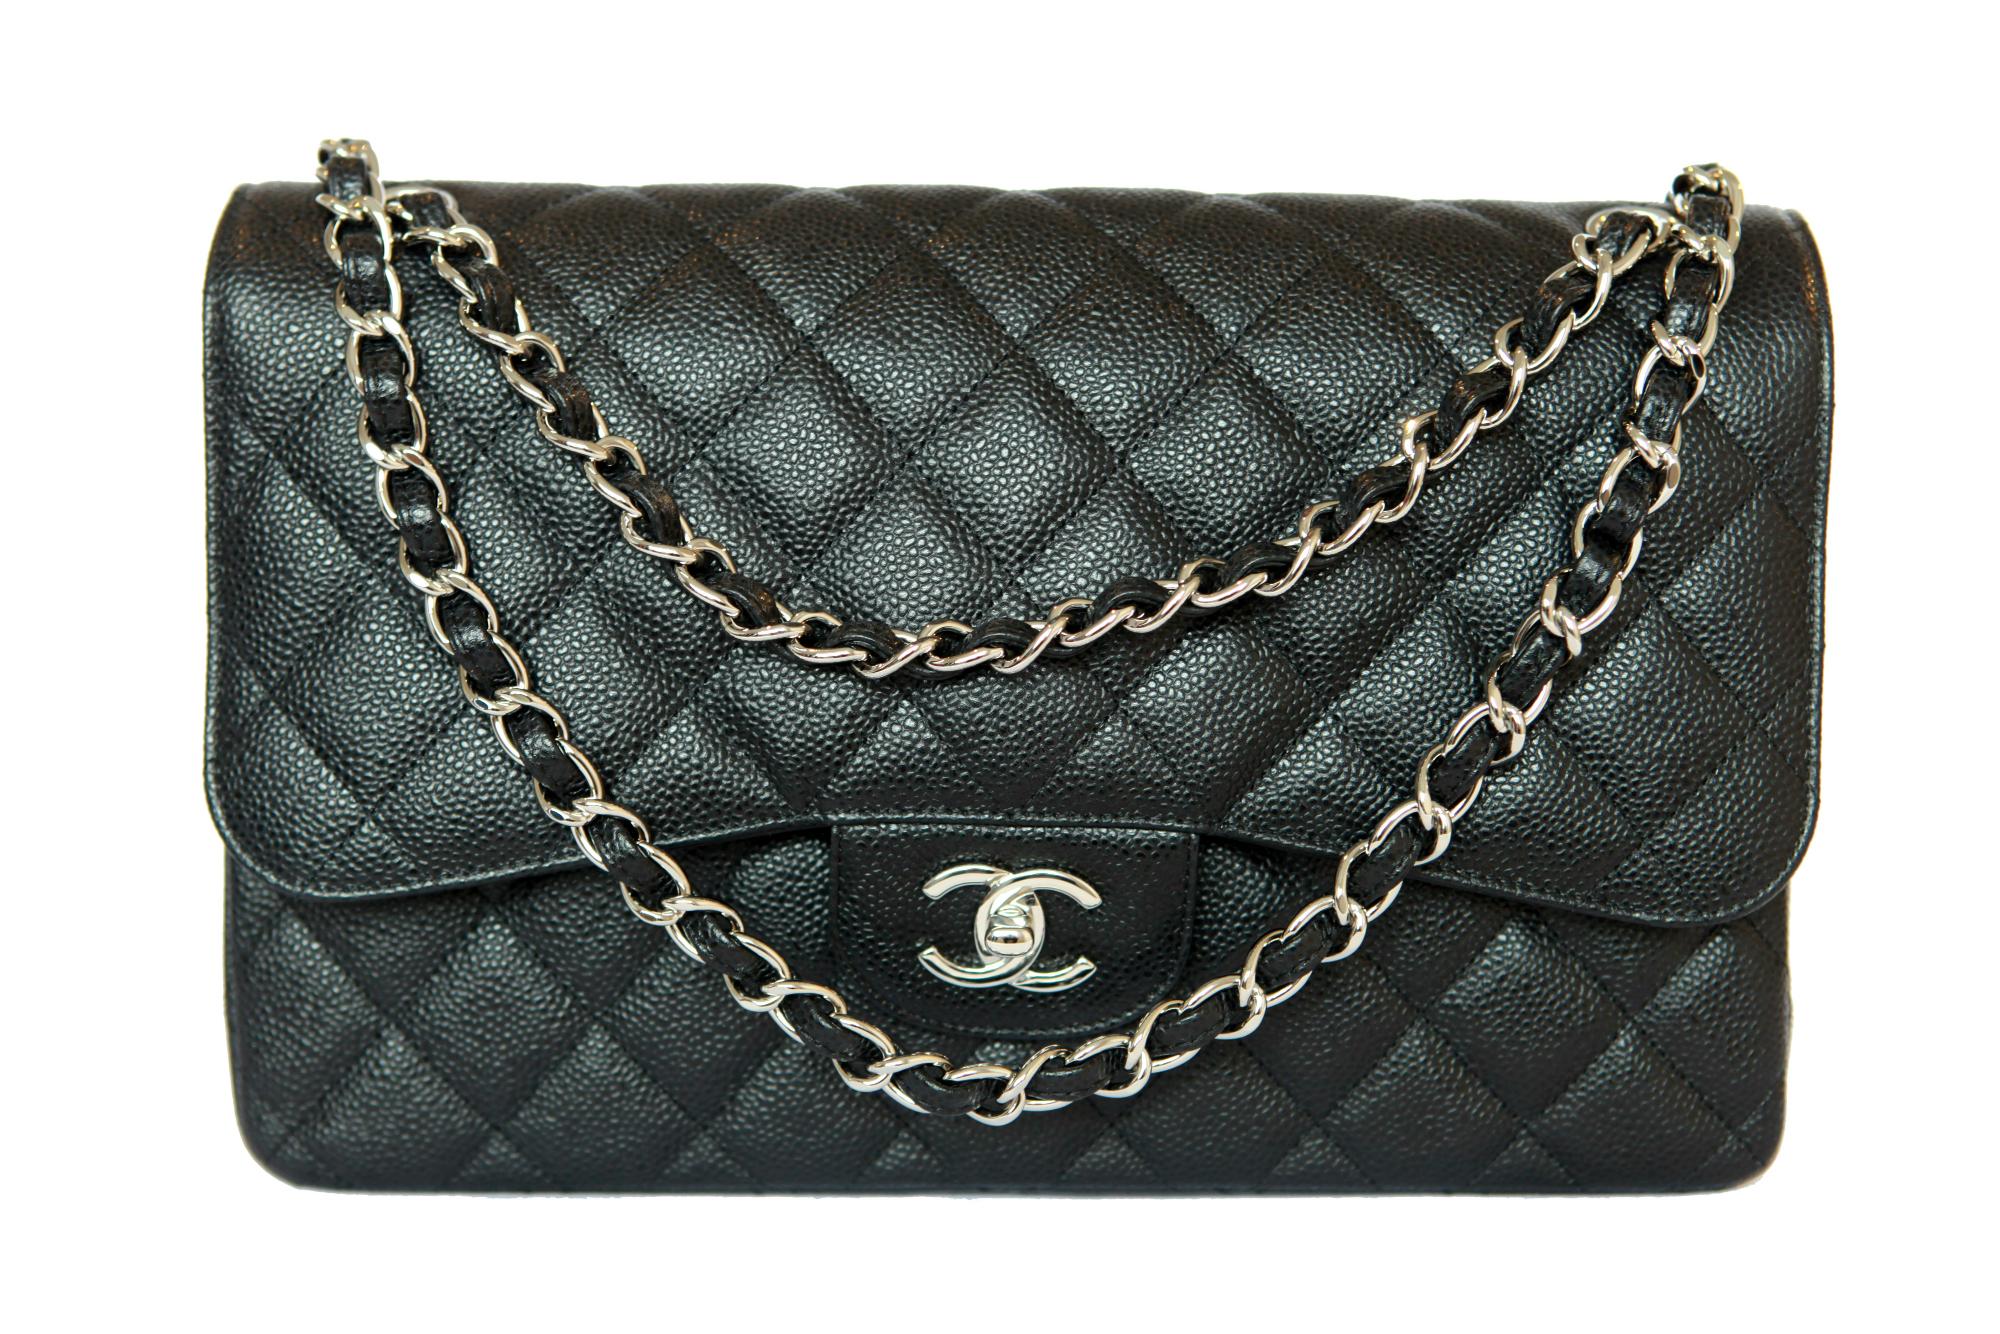 ec7578787ec1 Hire a CHANEL Classic Flap Bag a Timeless handbag from Elite Couture